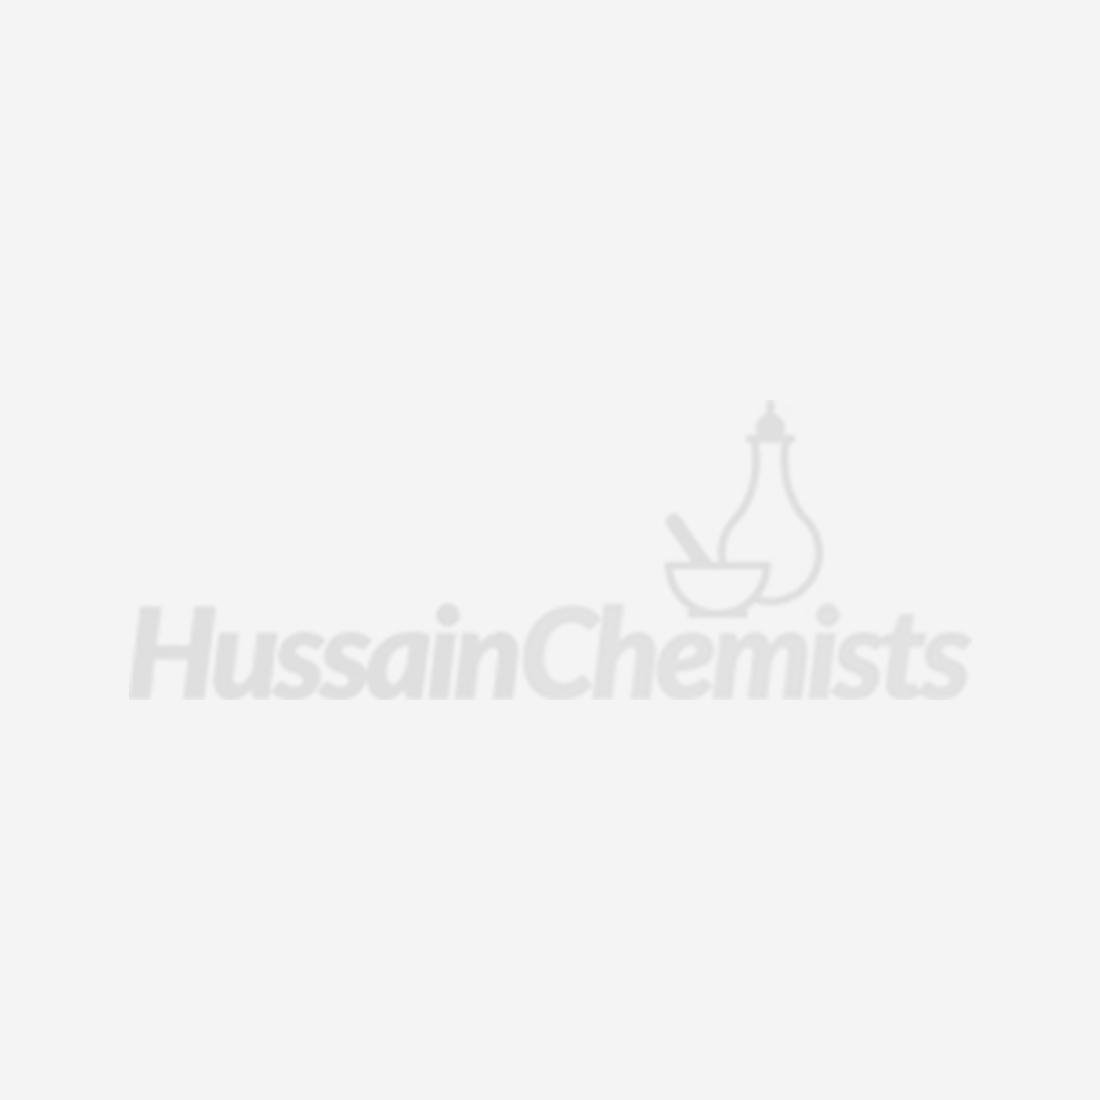 Plantur 39 200ml Phyto-Caffeine Tonic